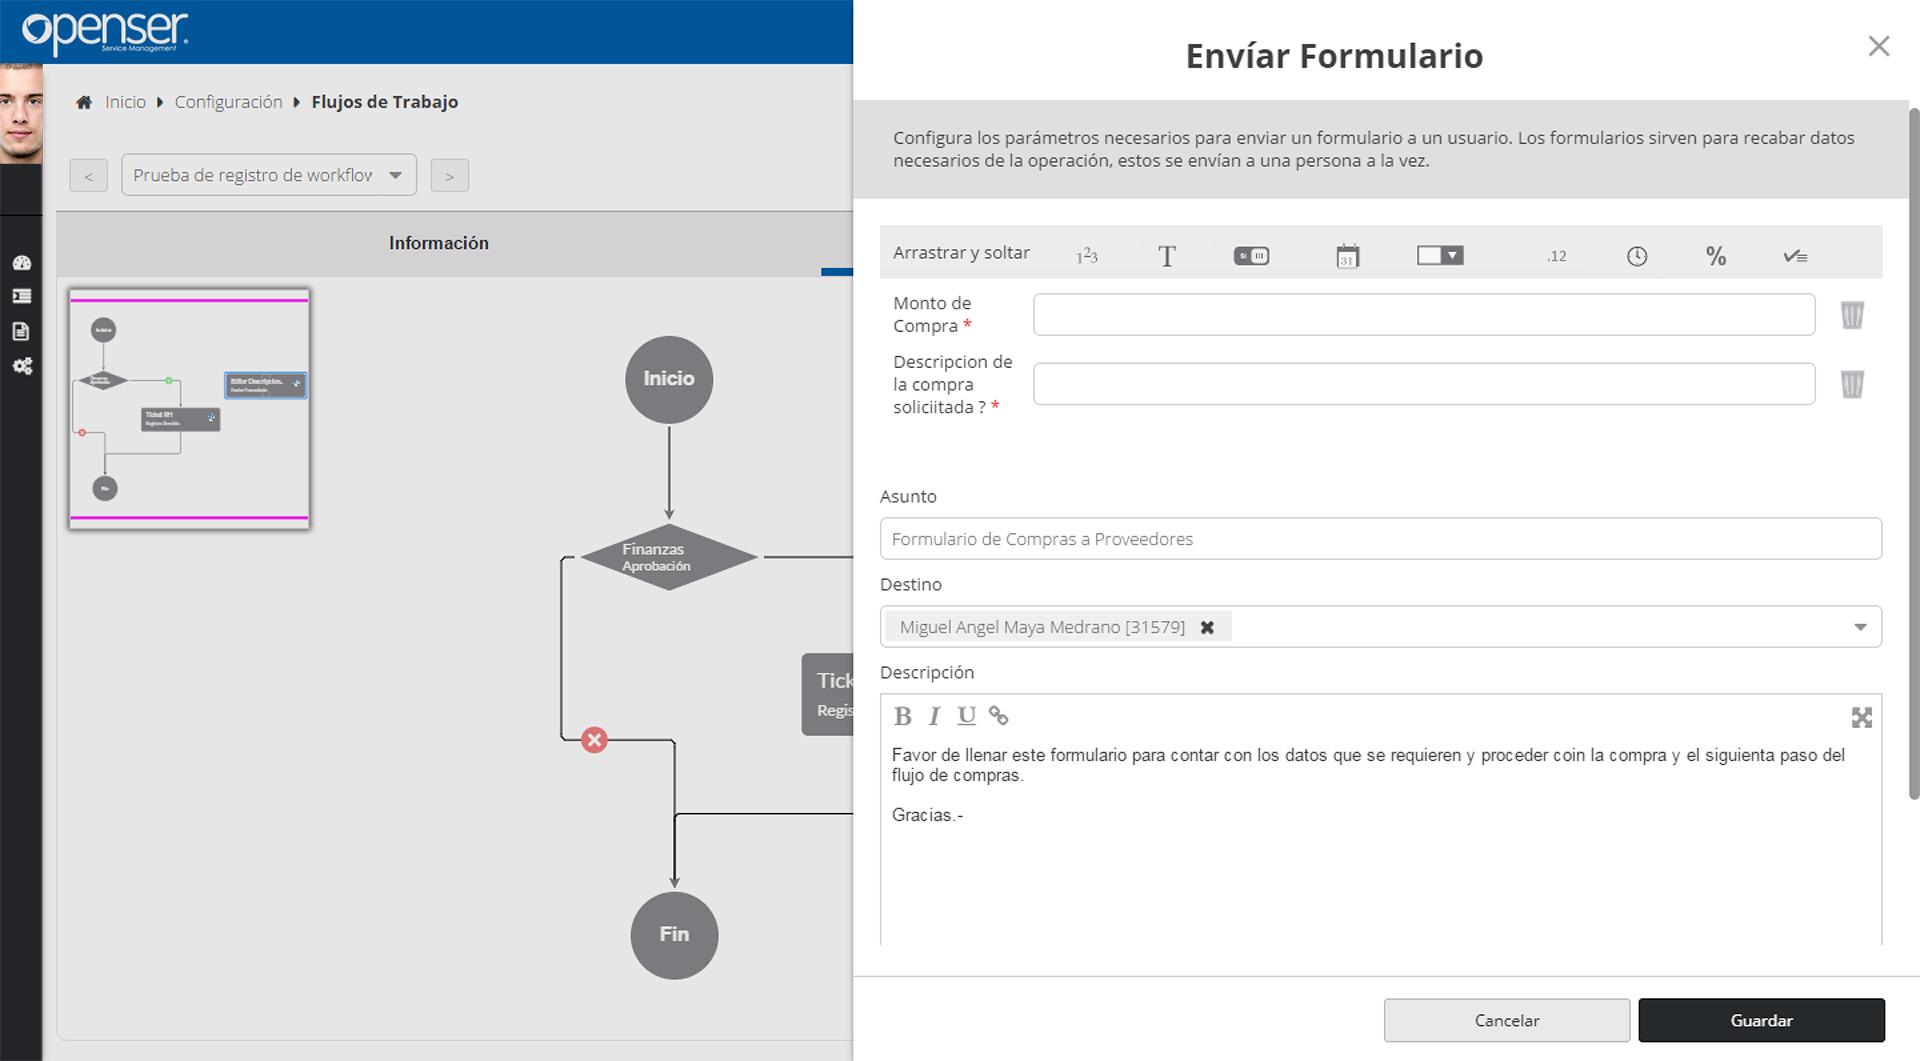 envia-formulario-openser